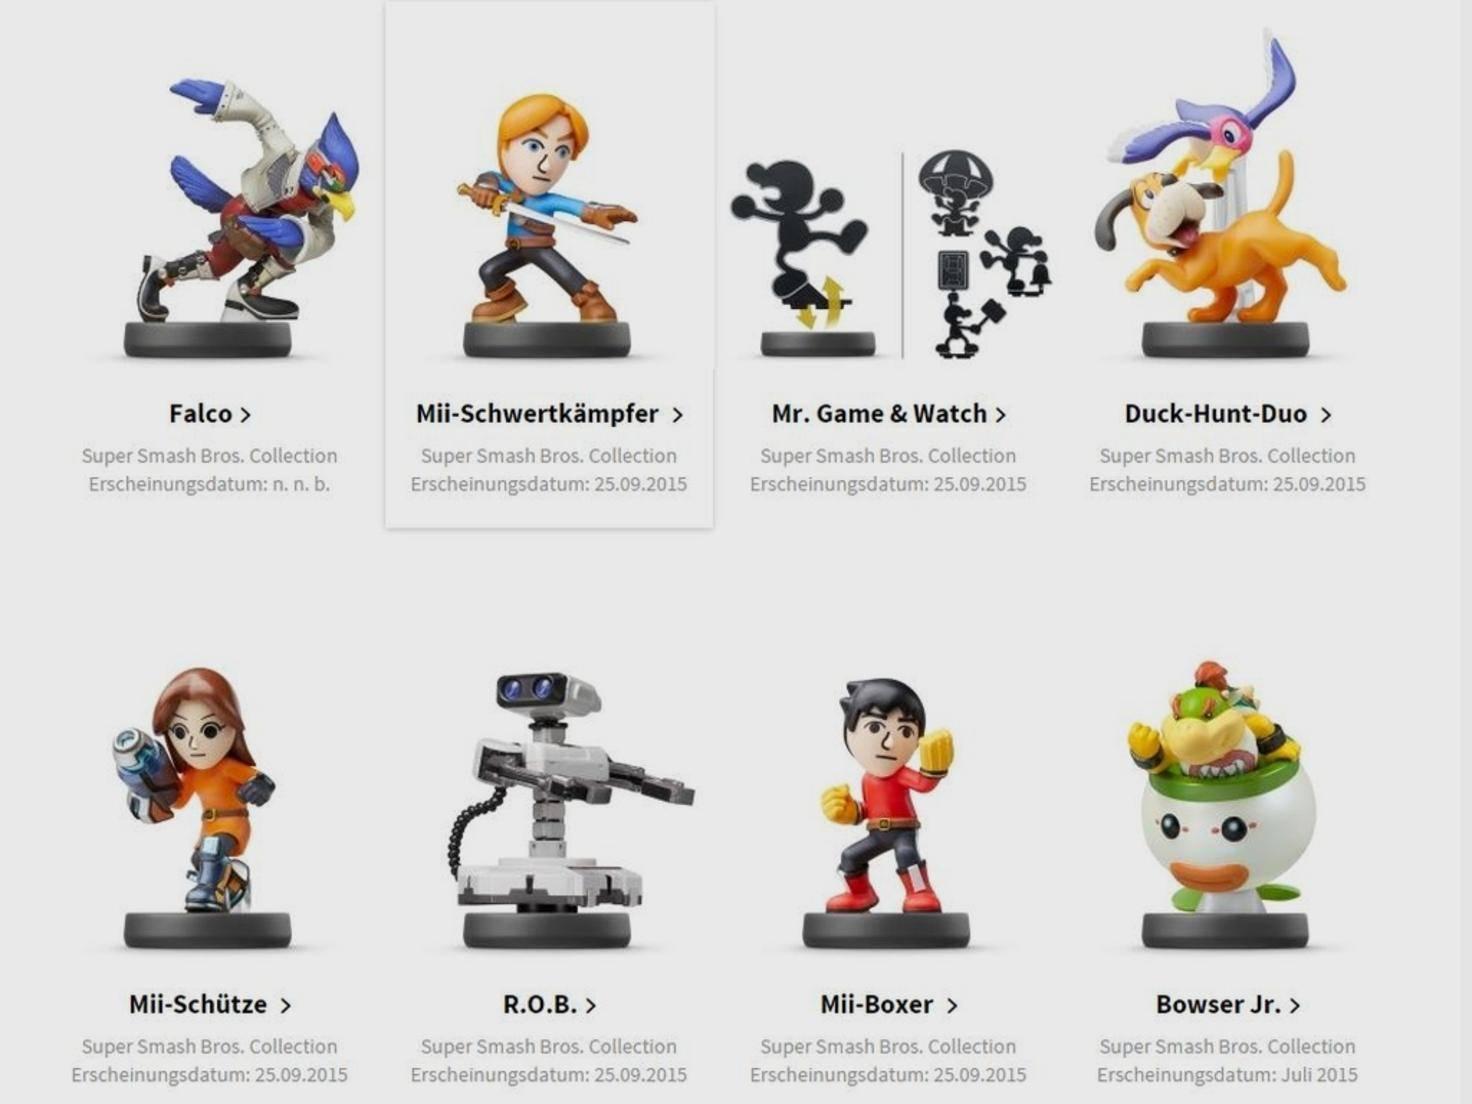 Neue Amiibos von Nintendo